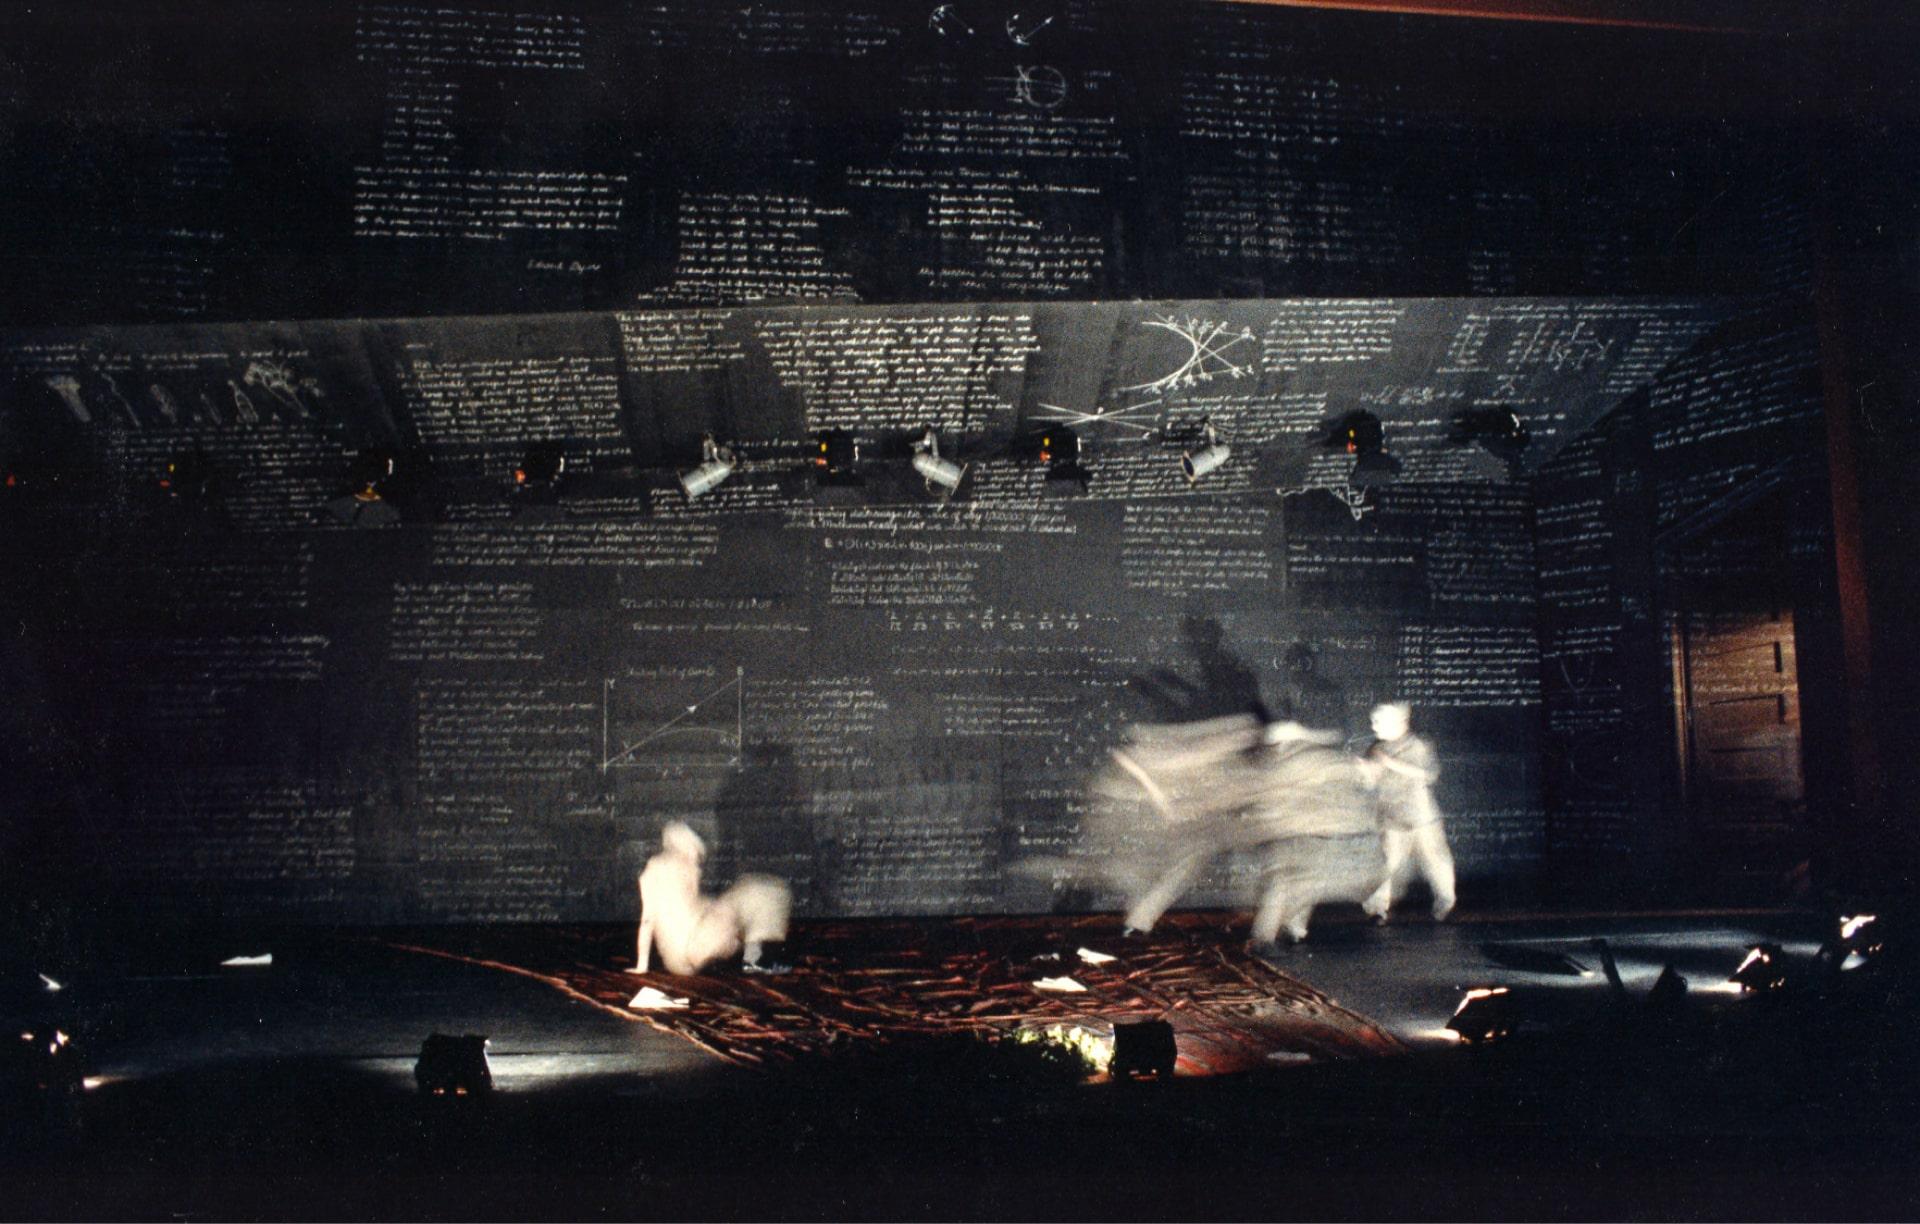 White figures blurred in motion against blackboard walls.